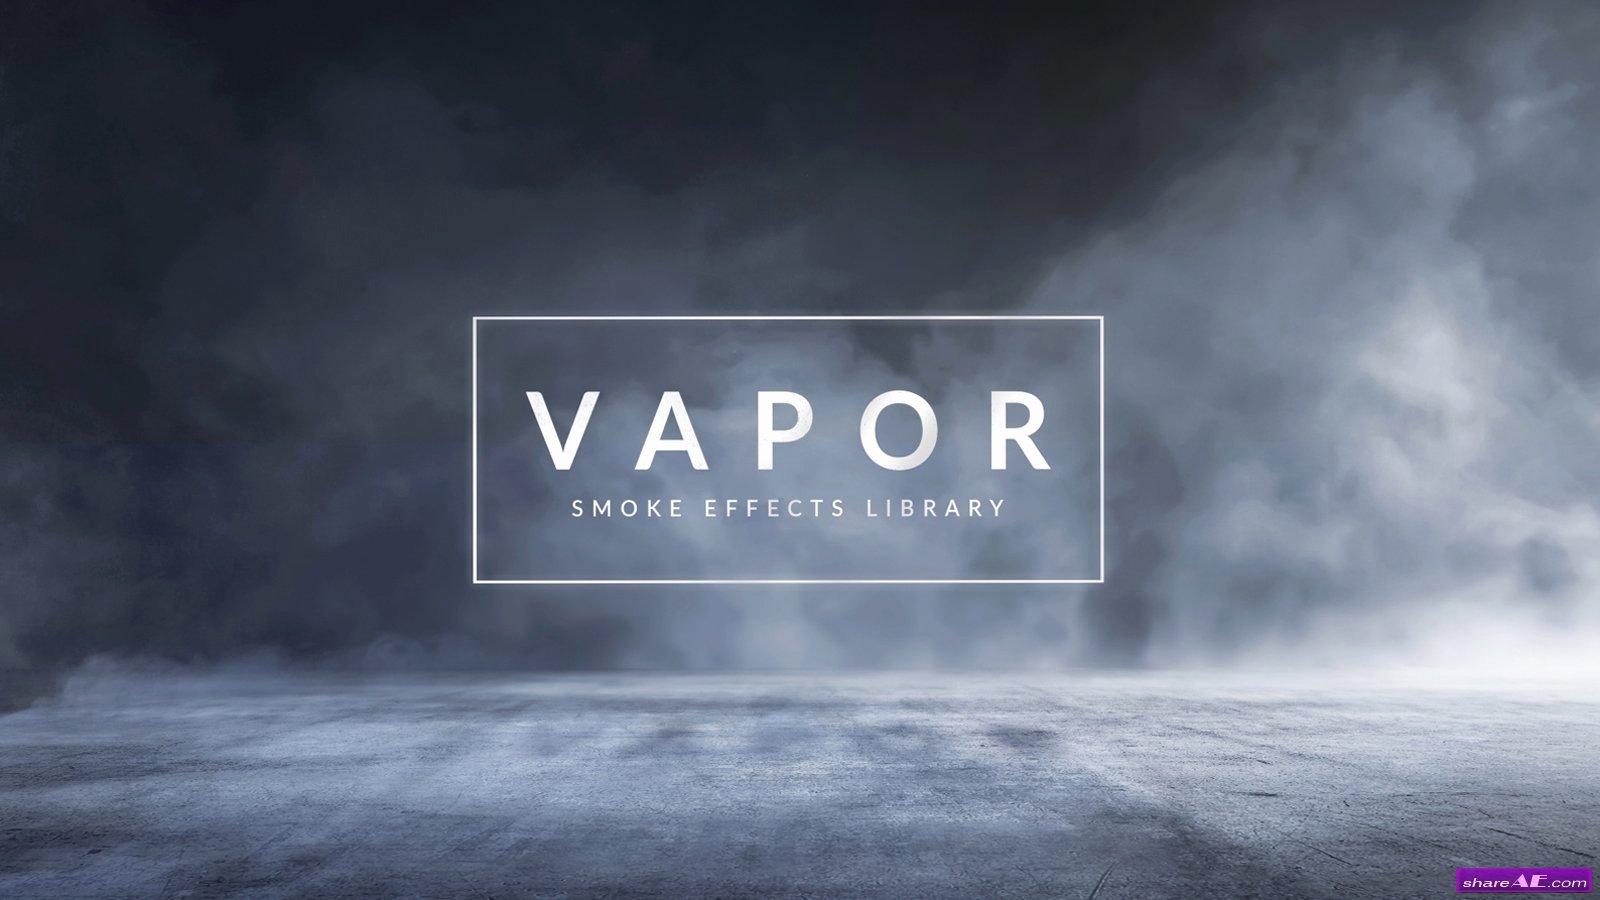 After Effects Lyric Video Template Luxury Vapor 100 Smoke & Fog Effects Rocketstock Free after